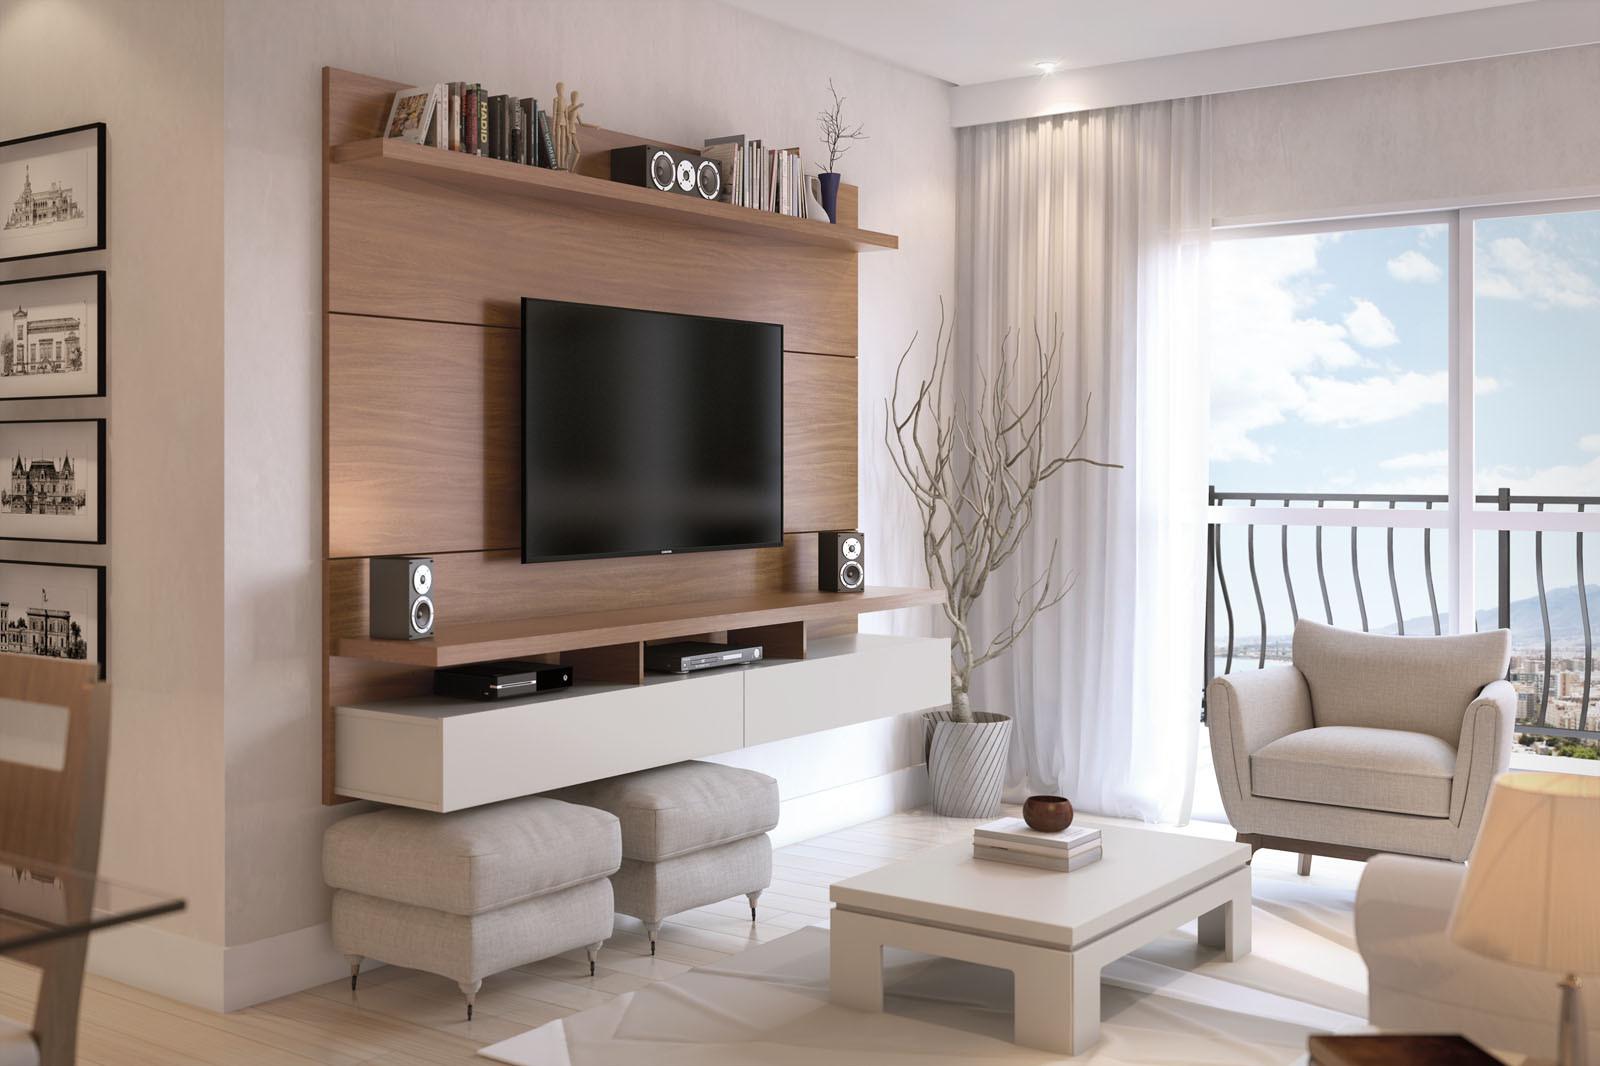 HOME SUSPENSO PROVNCIA CITY 220 NATURAL OFF WHITE  Home